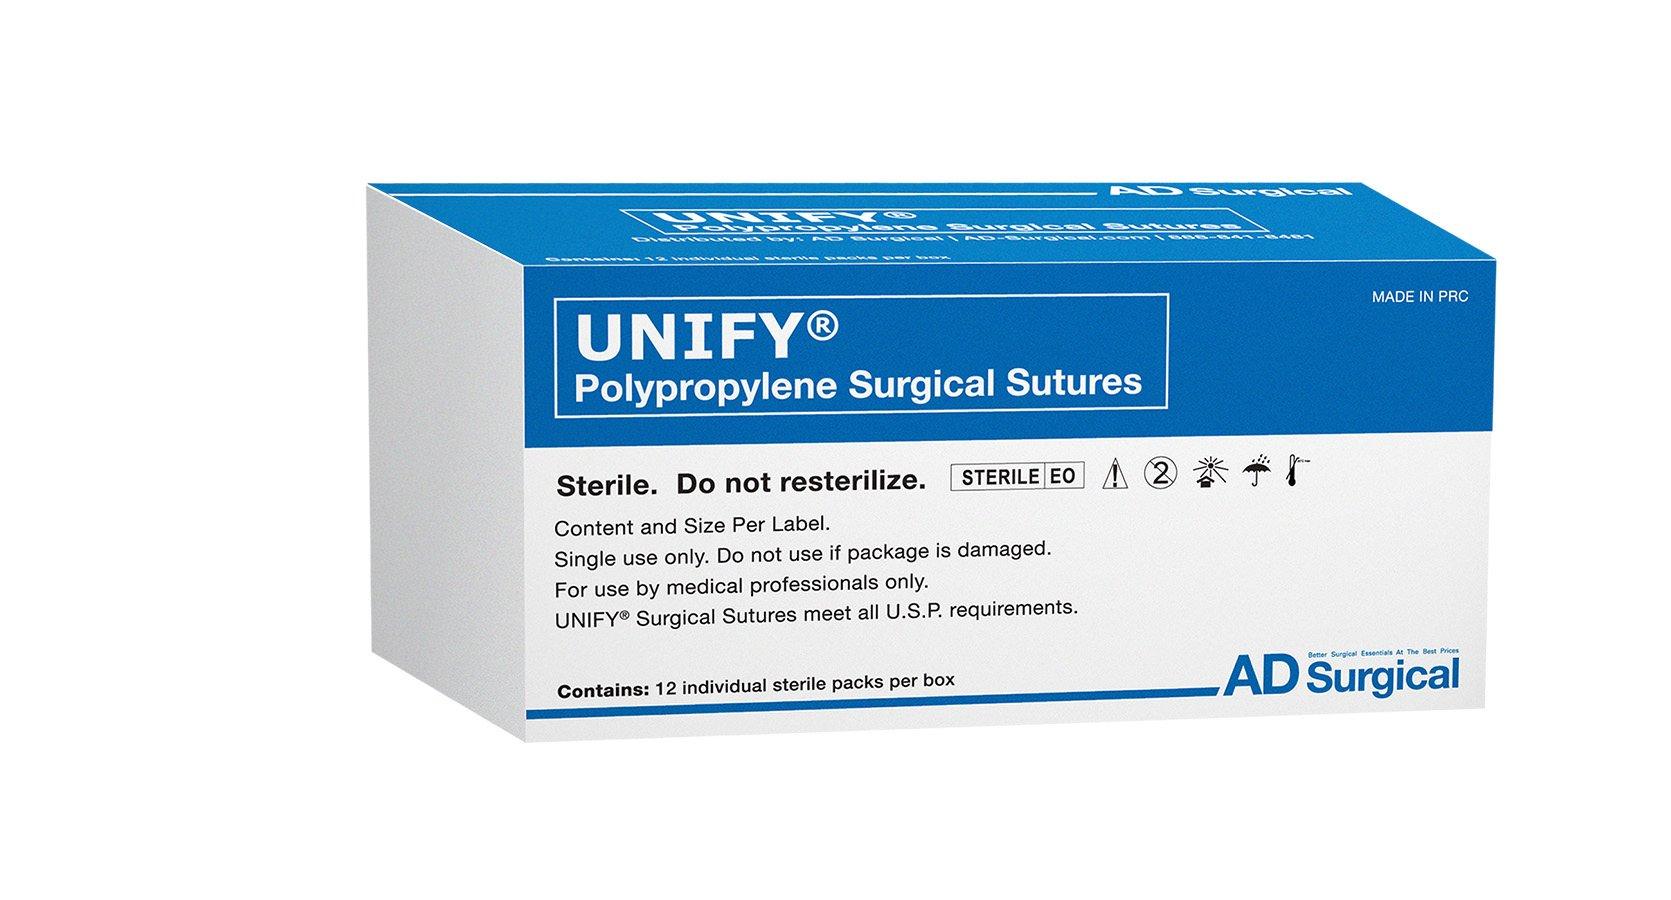 UNIFY Surgical Polypropylene Sutures. #S-P518R13 Non-Absorbable. Mono Blue. Size 5/0. 18''45cm Thread. 13mm 3/8 Circle R/C Needle (P-3/P-13). 12 Foil Packs/Box.